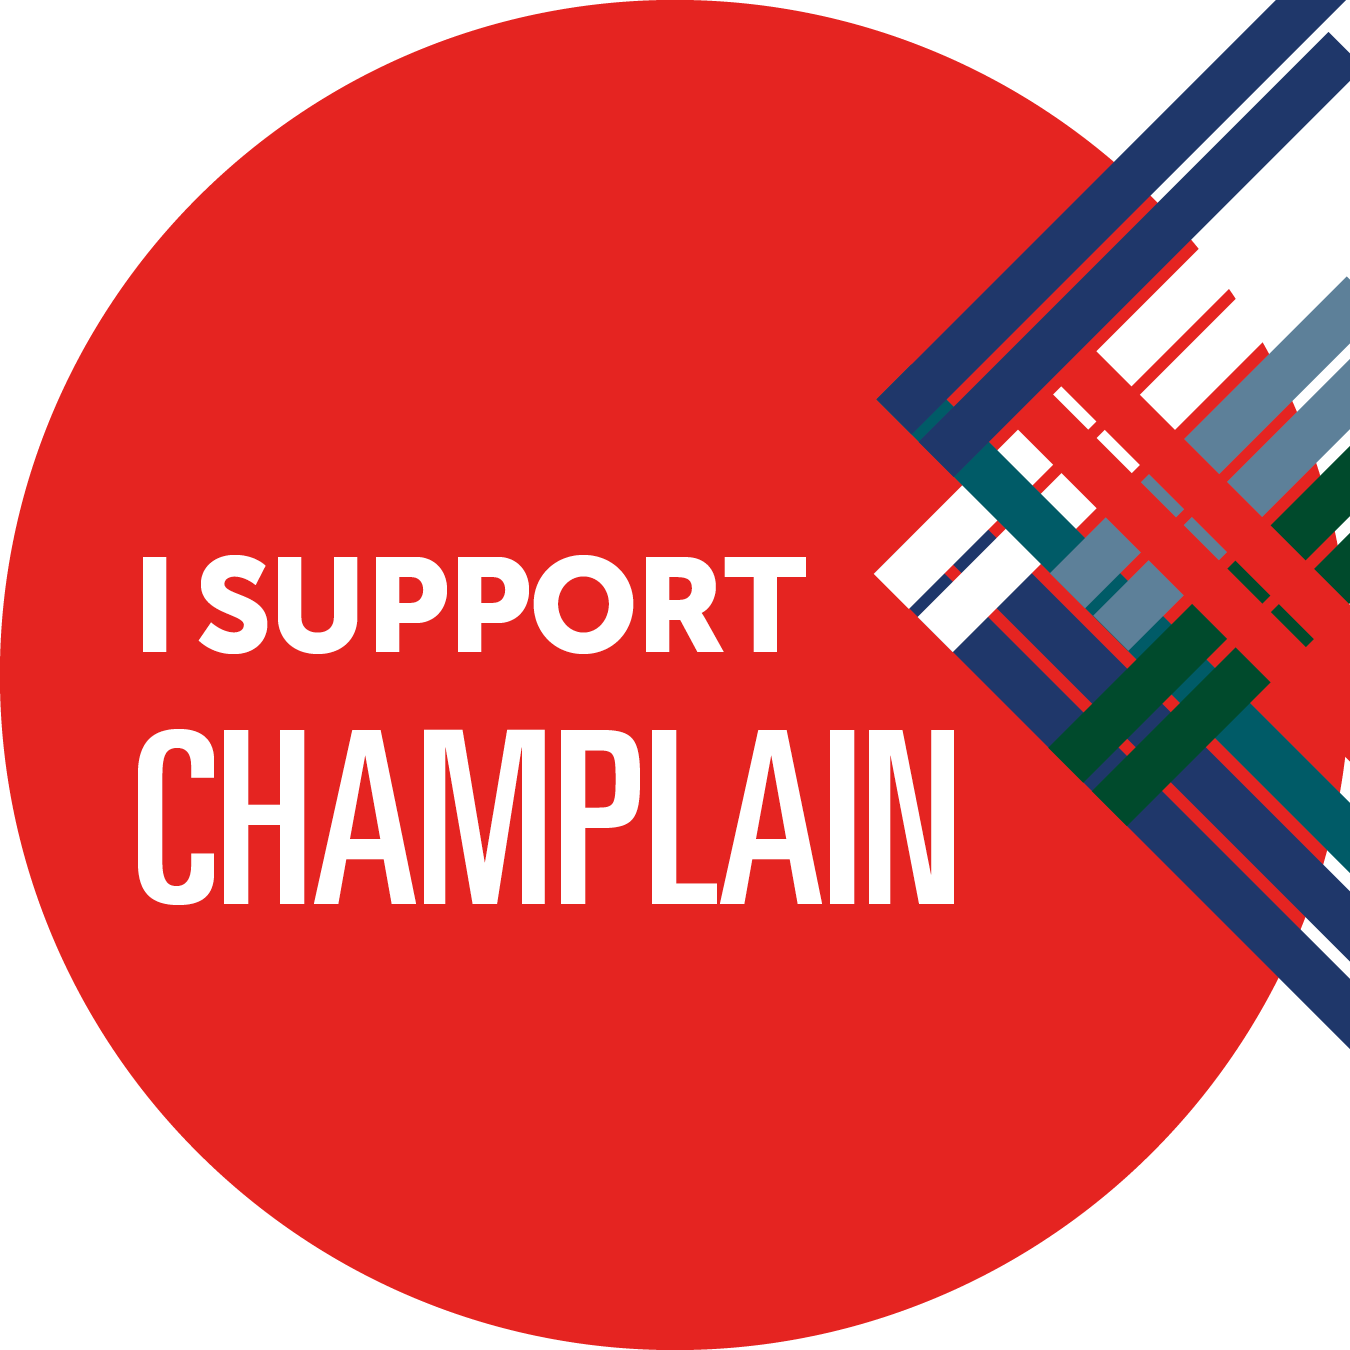 I support Champlain